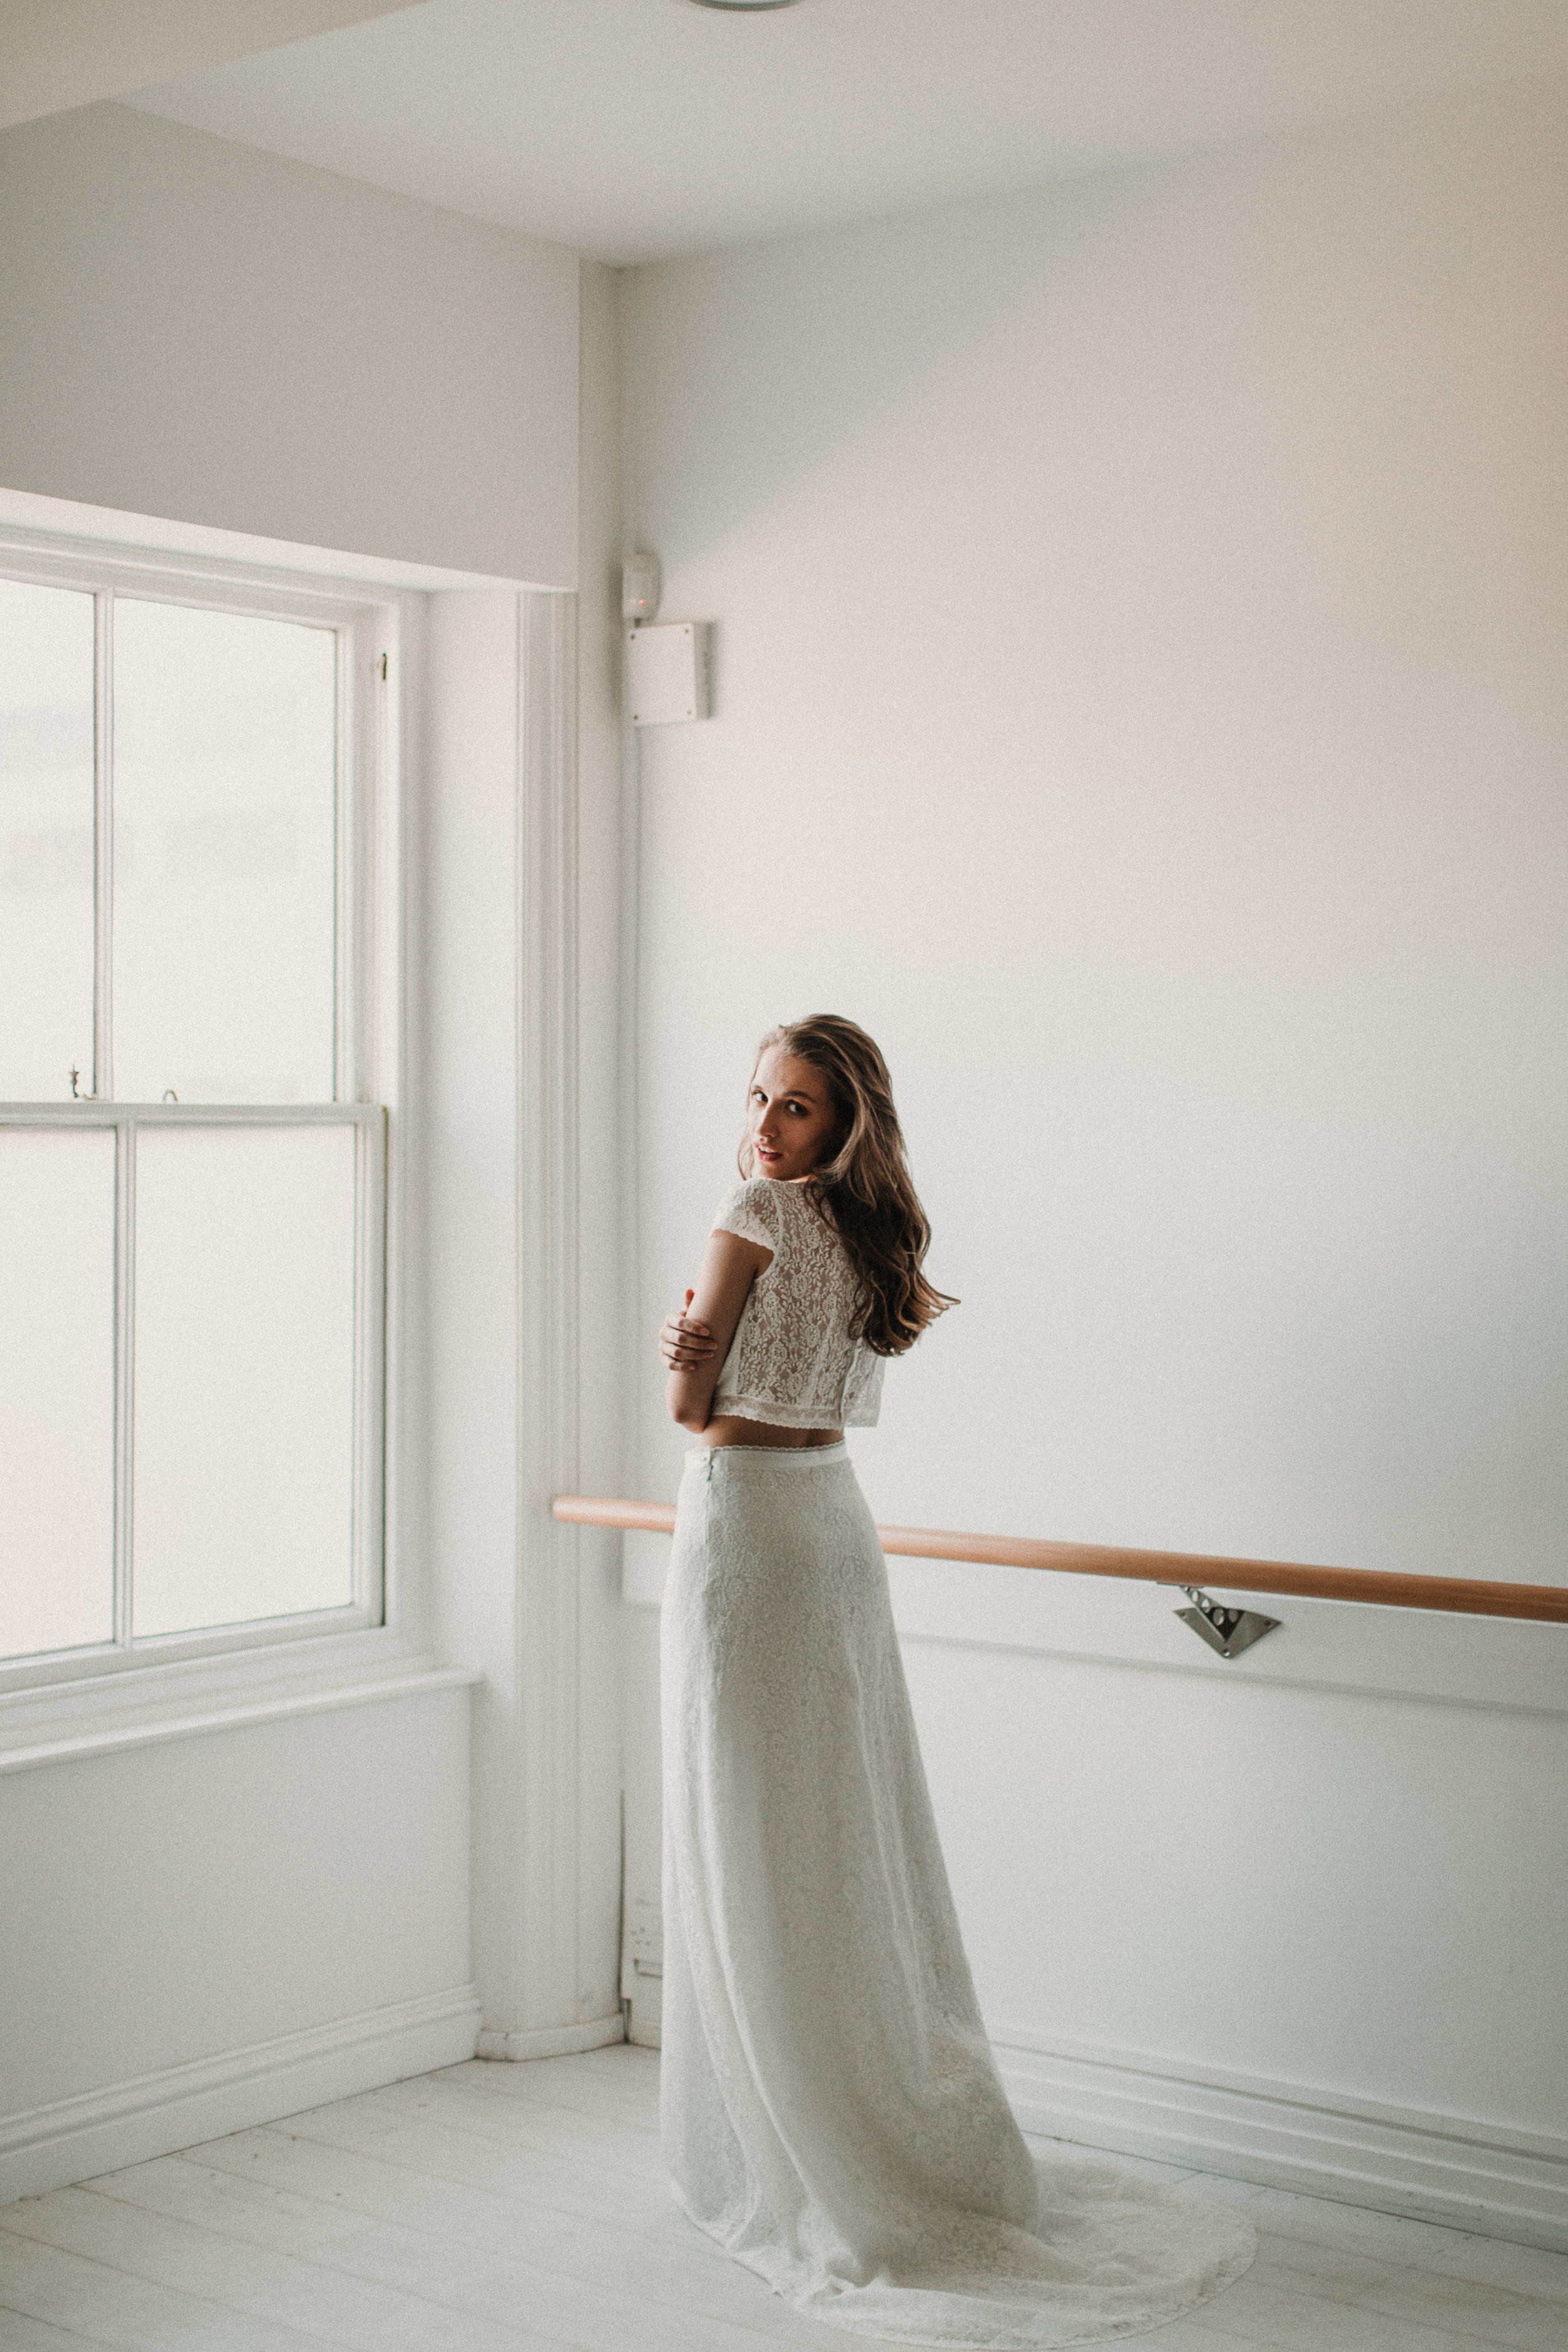 npluck_luna_bride-7.jpg